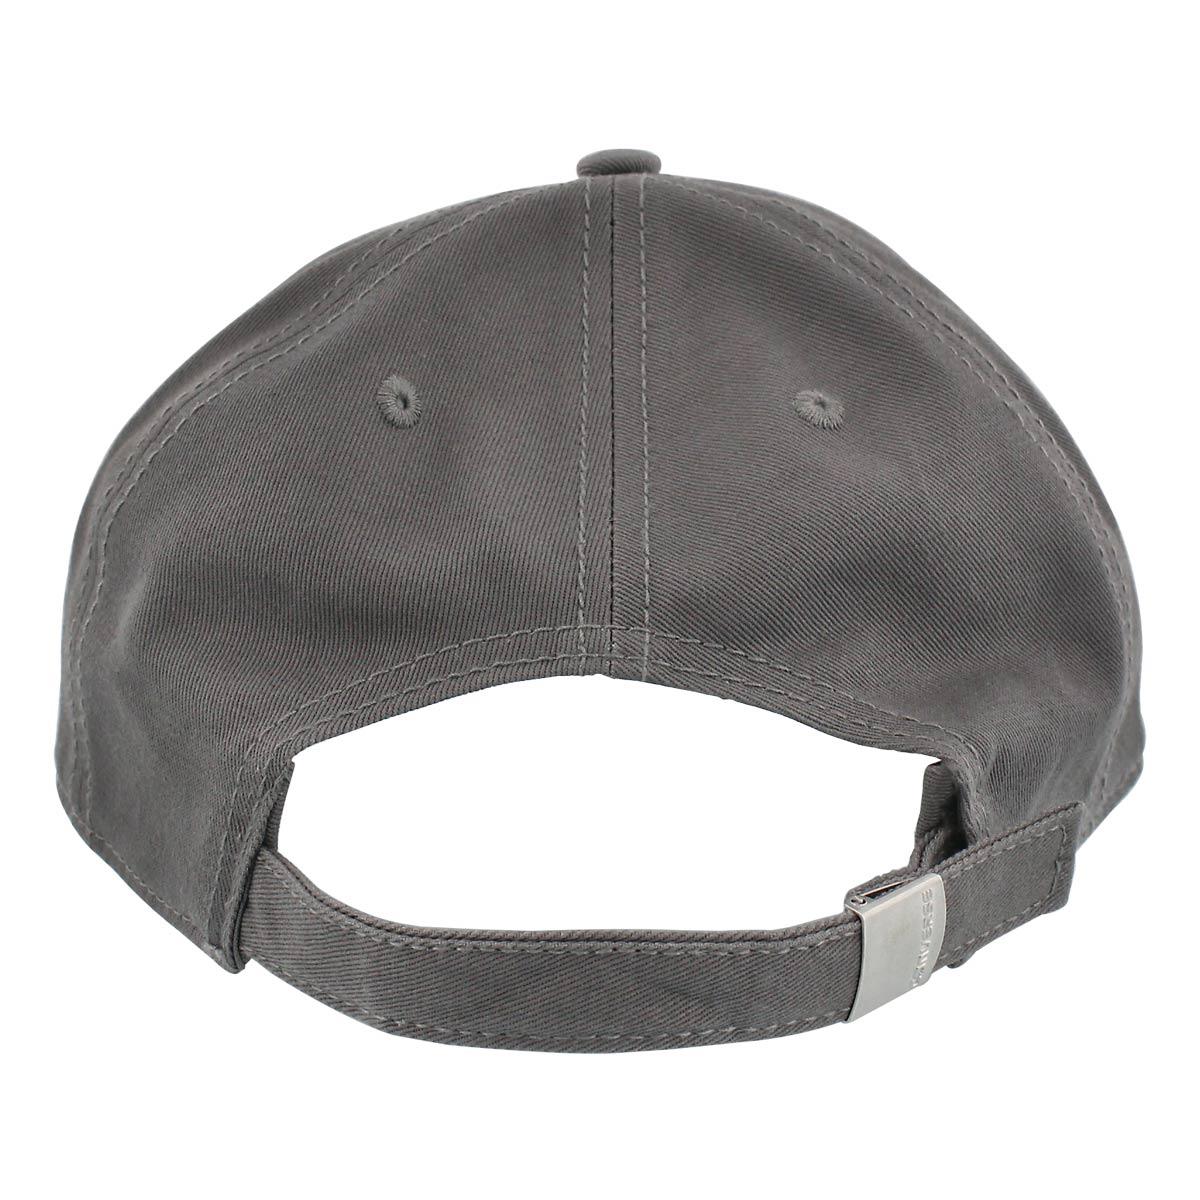 Mns Core char adjustable precurve cap